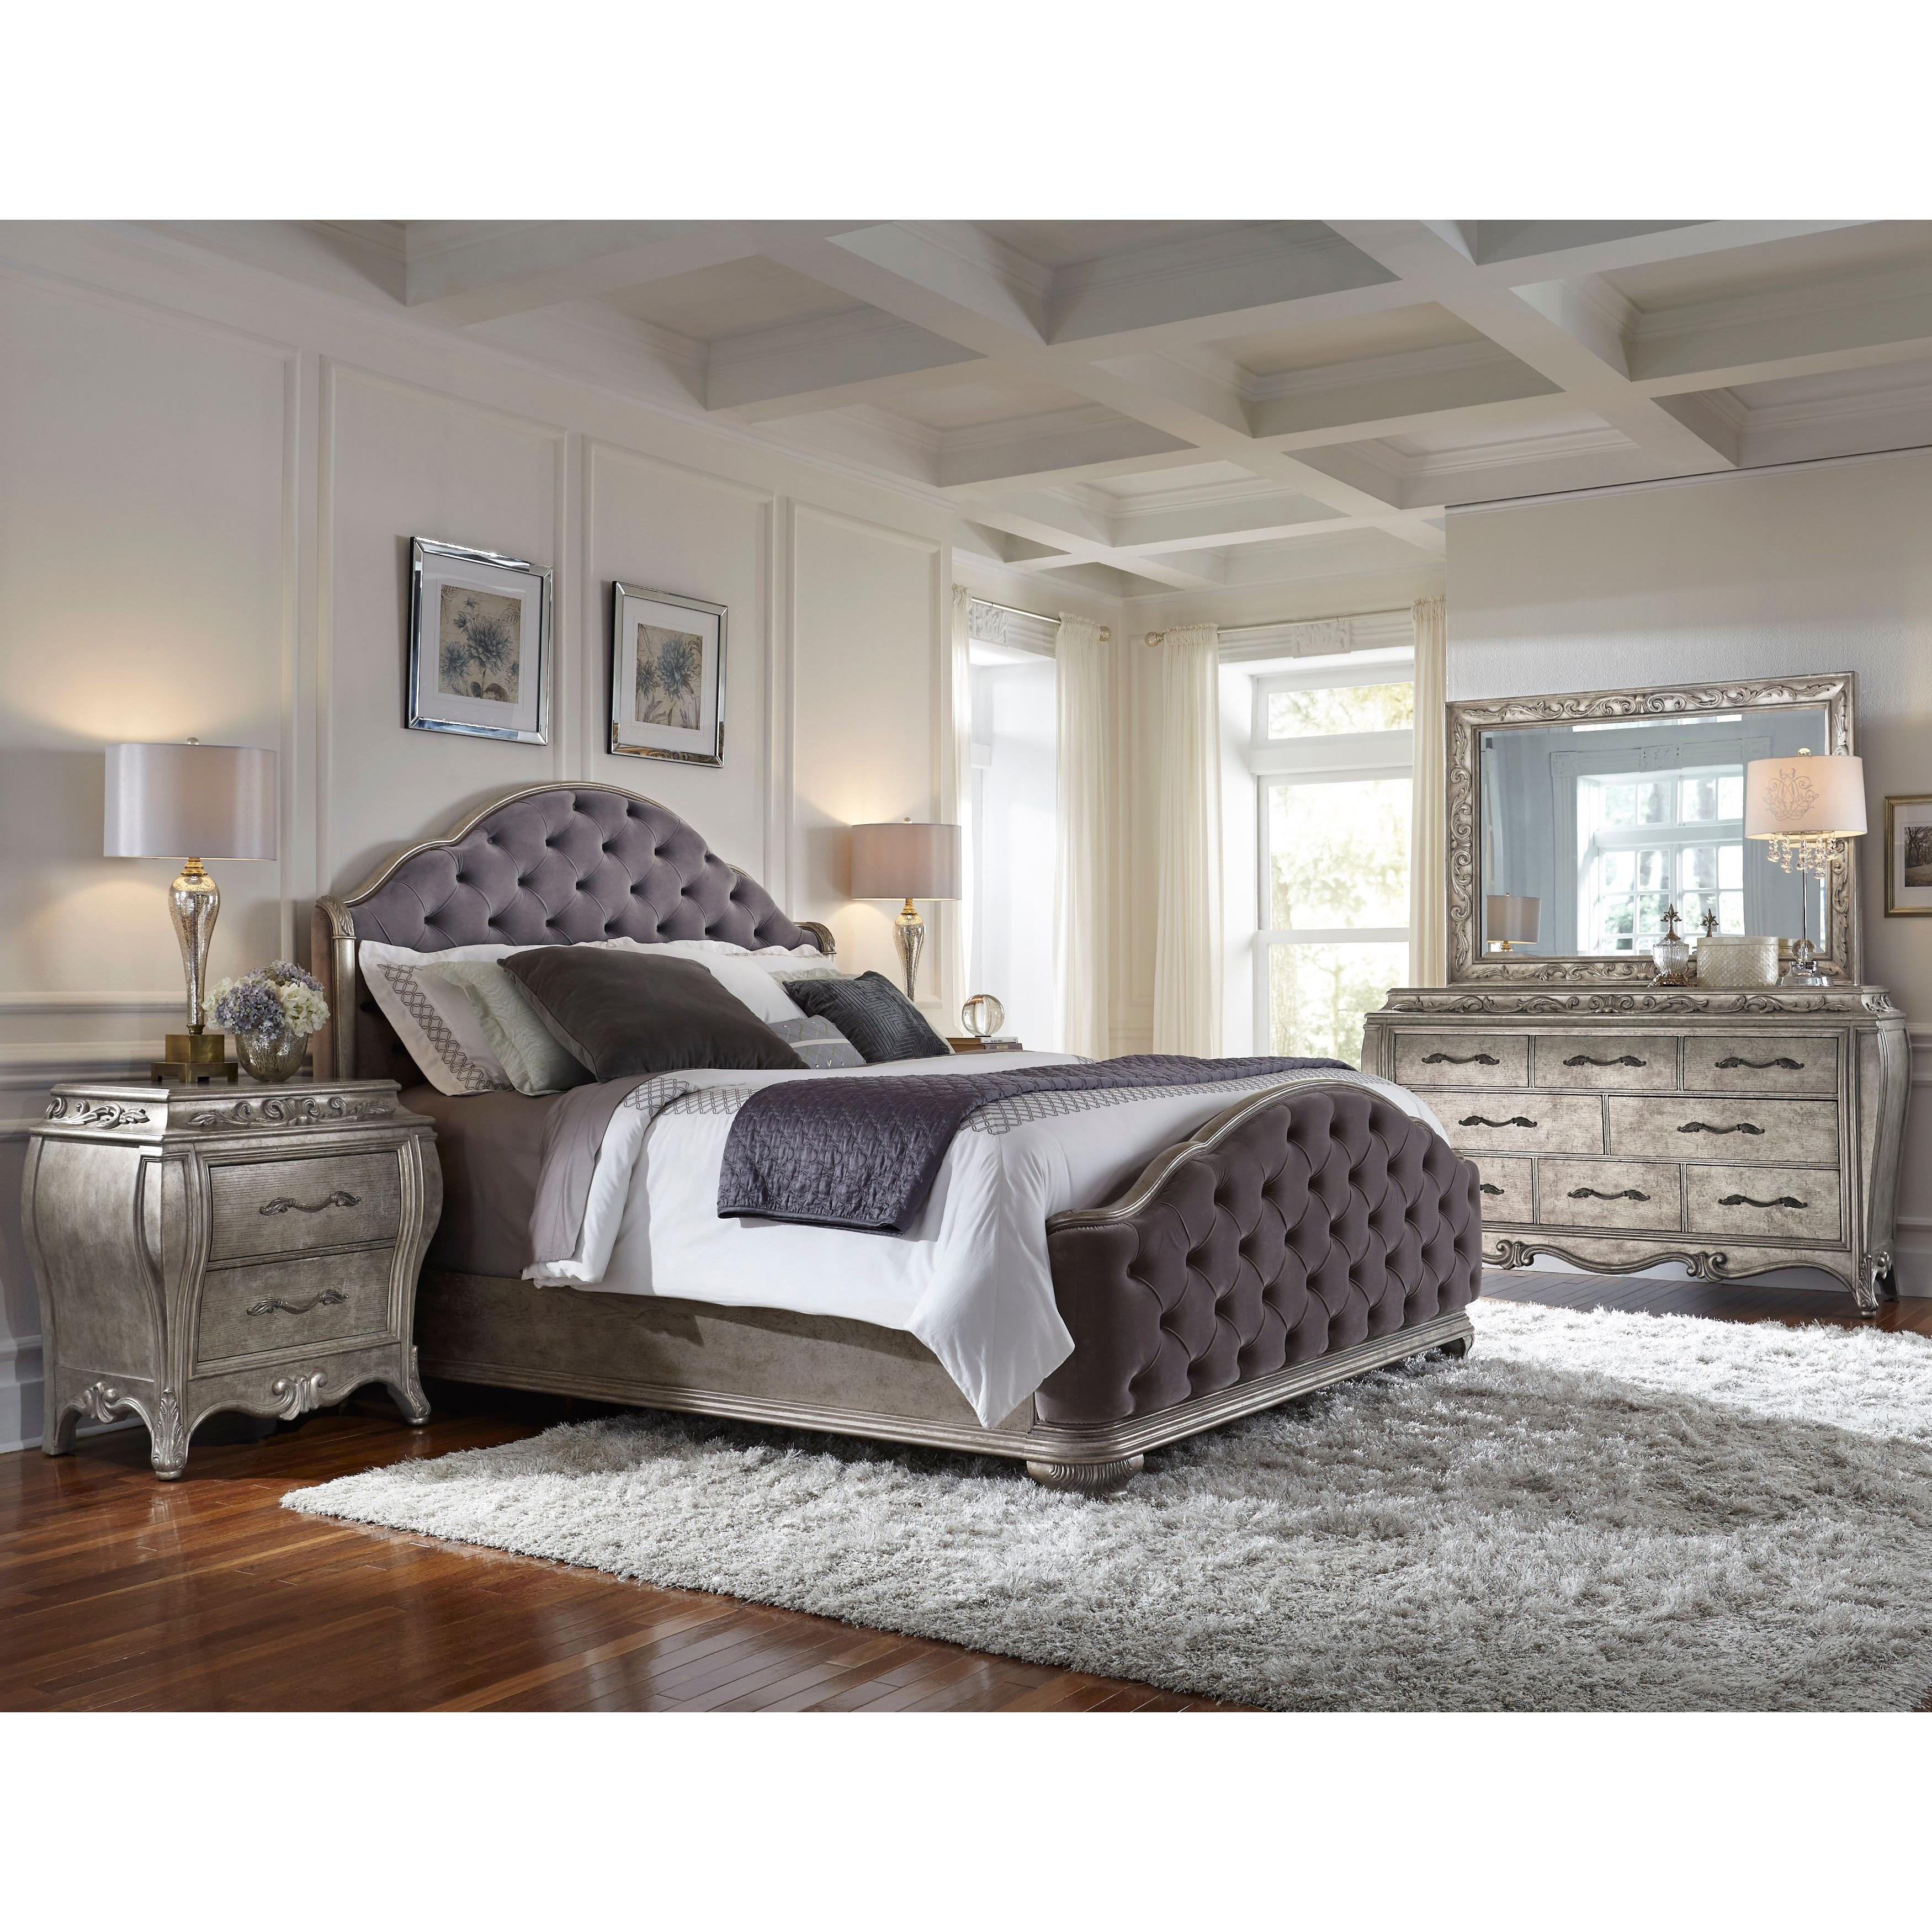 King Size Bed.Anastasia King Size Bed Frame